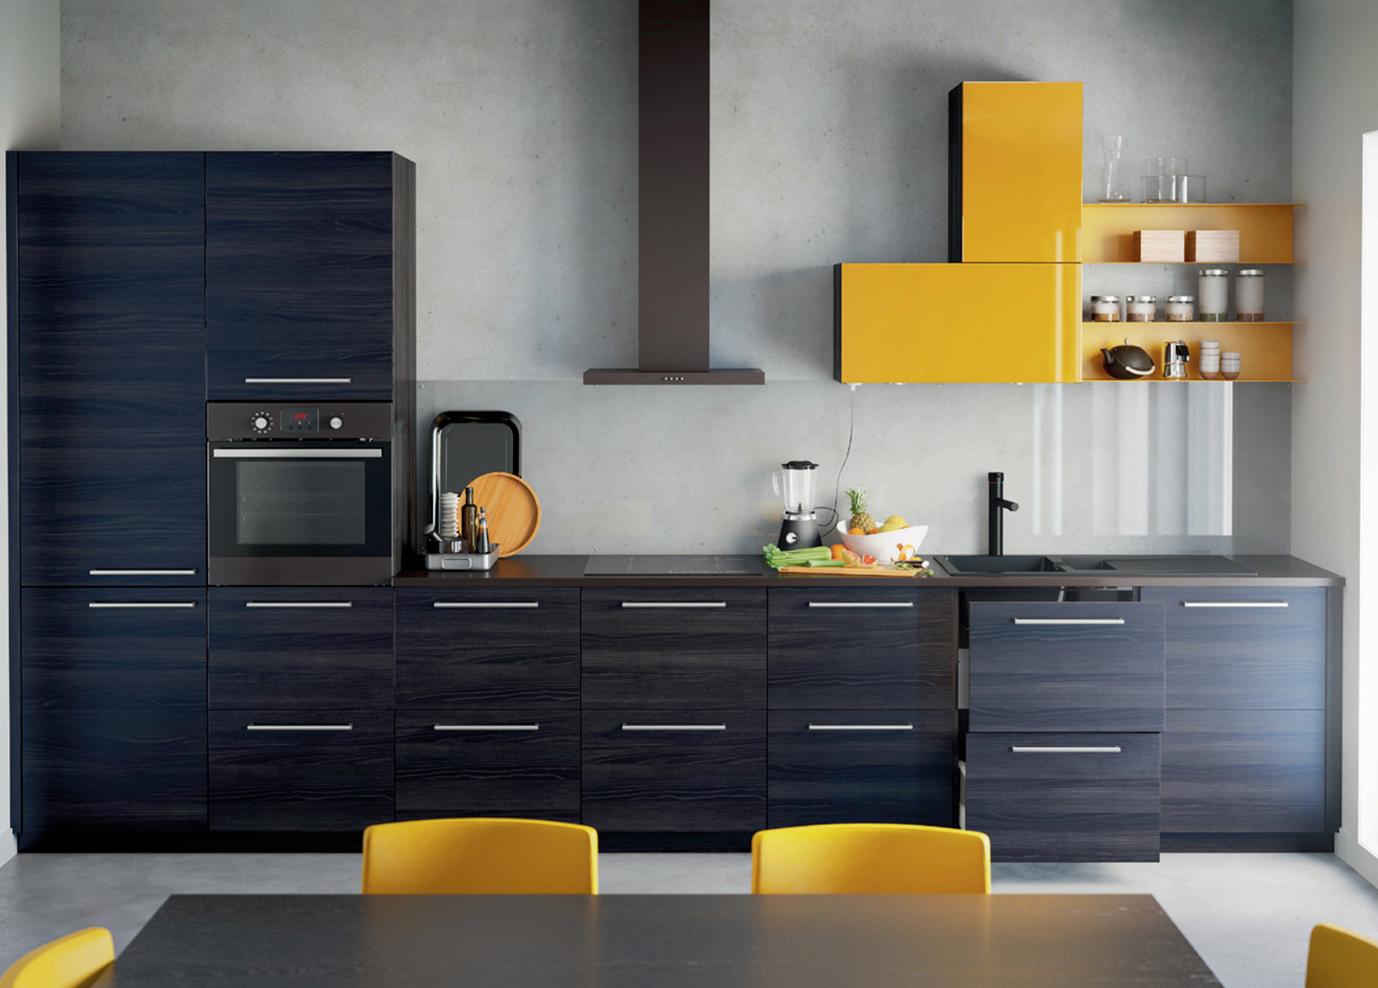 Muebles Cocina Ikea Catalogo | Ikea 2015 Kitchen Cocinas Ikea New Stuff Pinterest Ikea